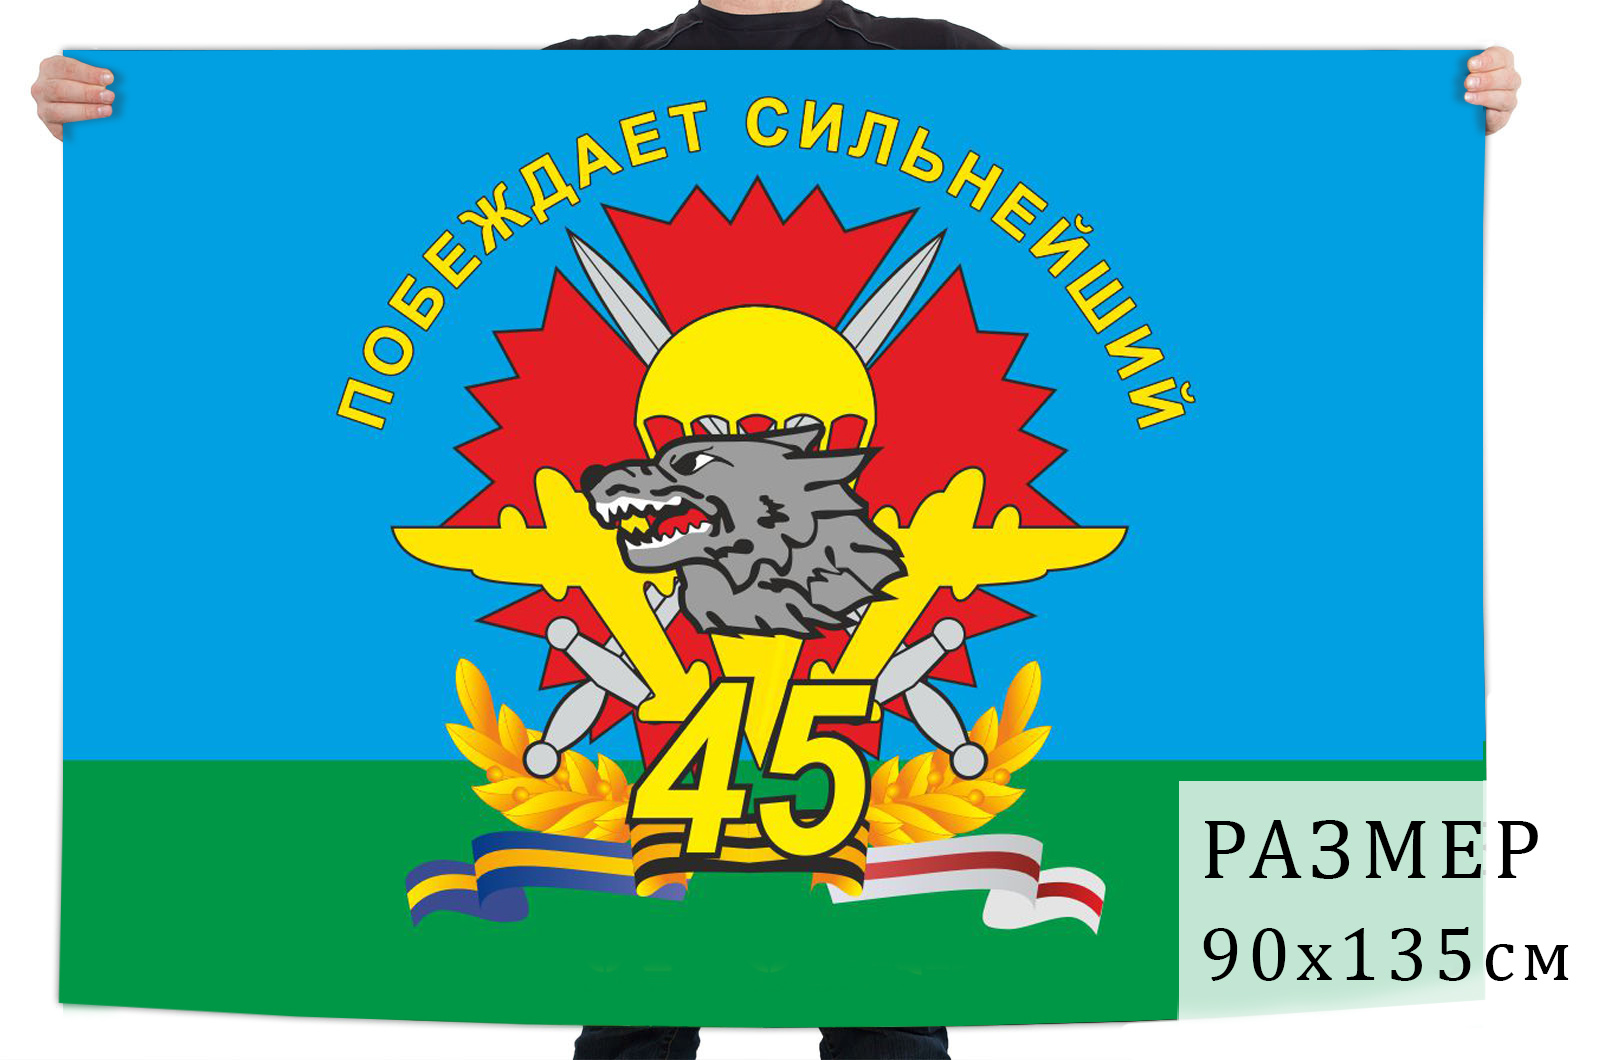 "Флаг спецназа ВДВ ""Побеждает сильнейший"" 45 бригада"